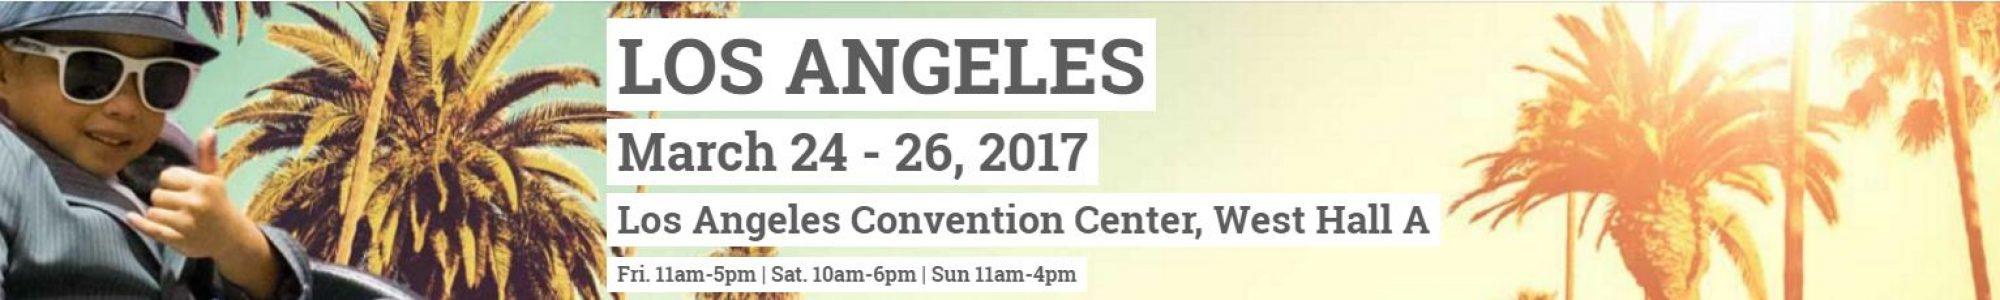 2017 LA Abilities Expo!